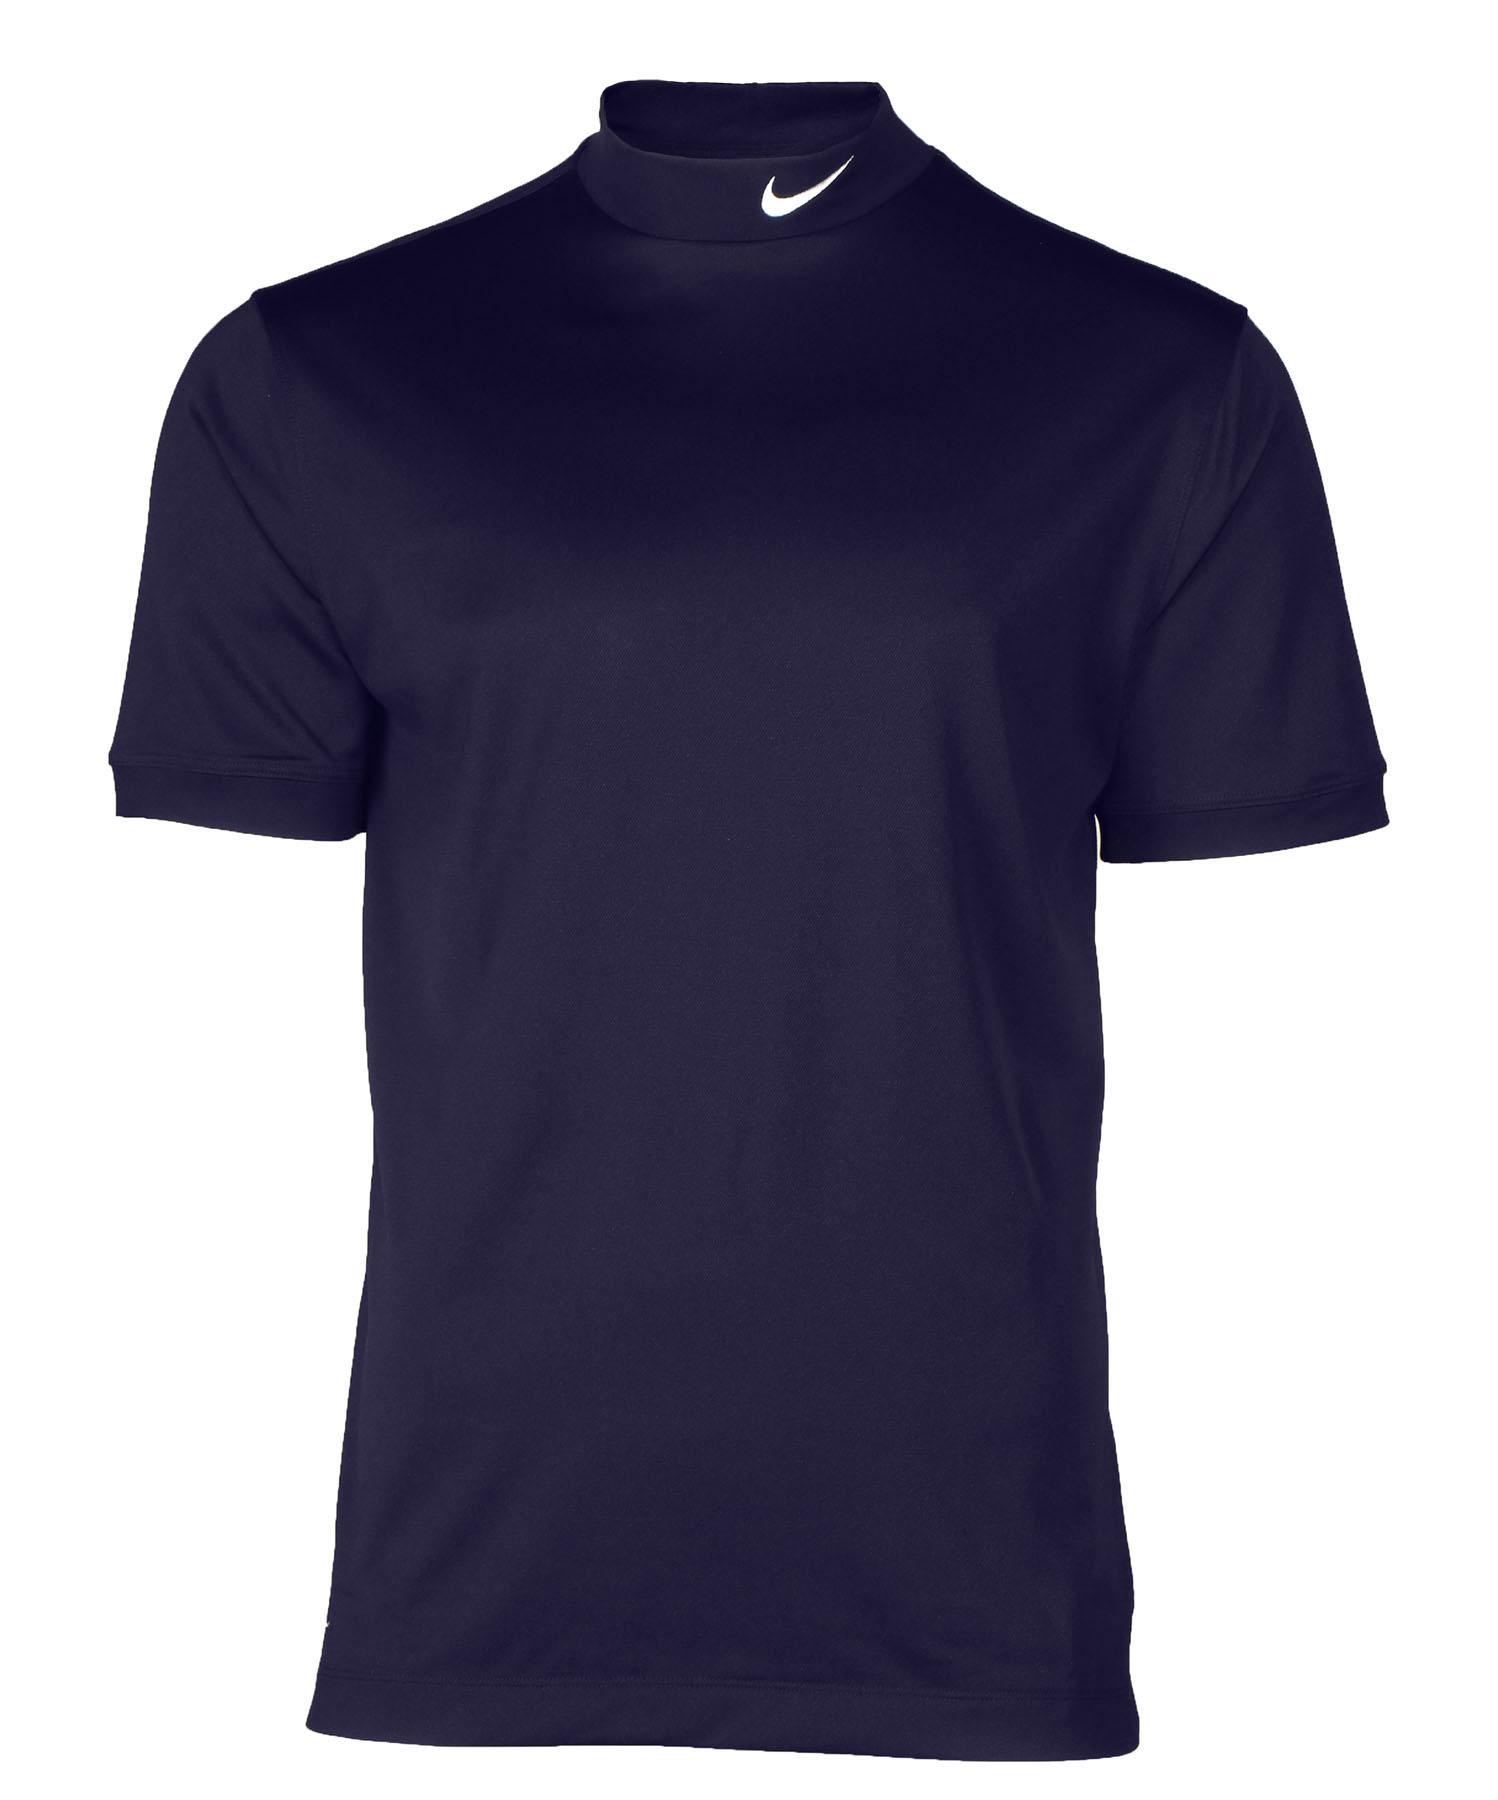 Nike men 39 s tech uv mock neck dri fit short sleeve shirt ebay for Mens mock turtleneck shirts sale